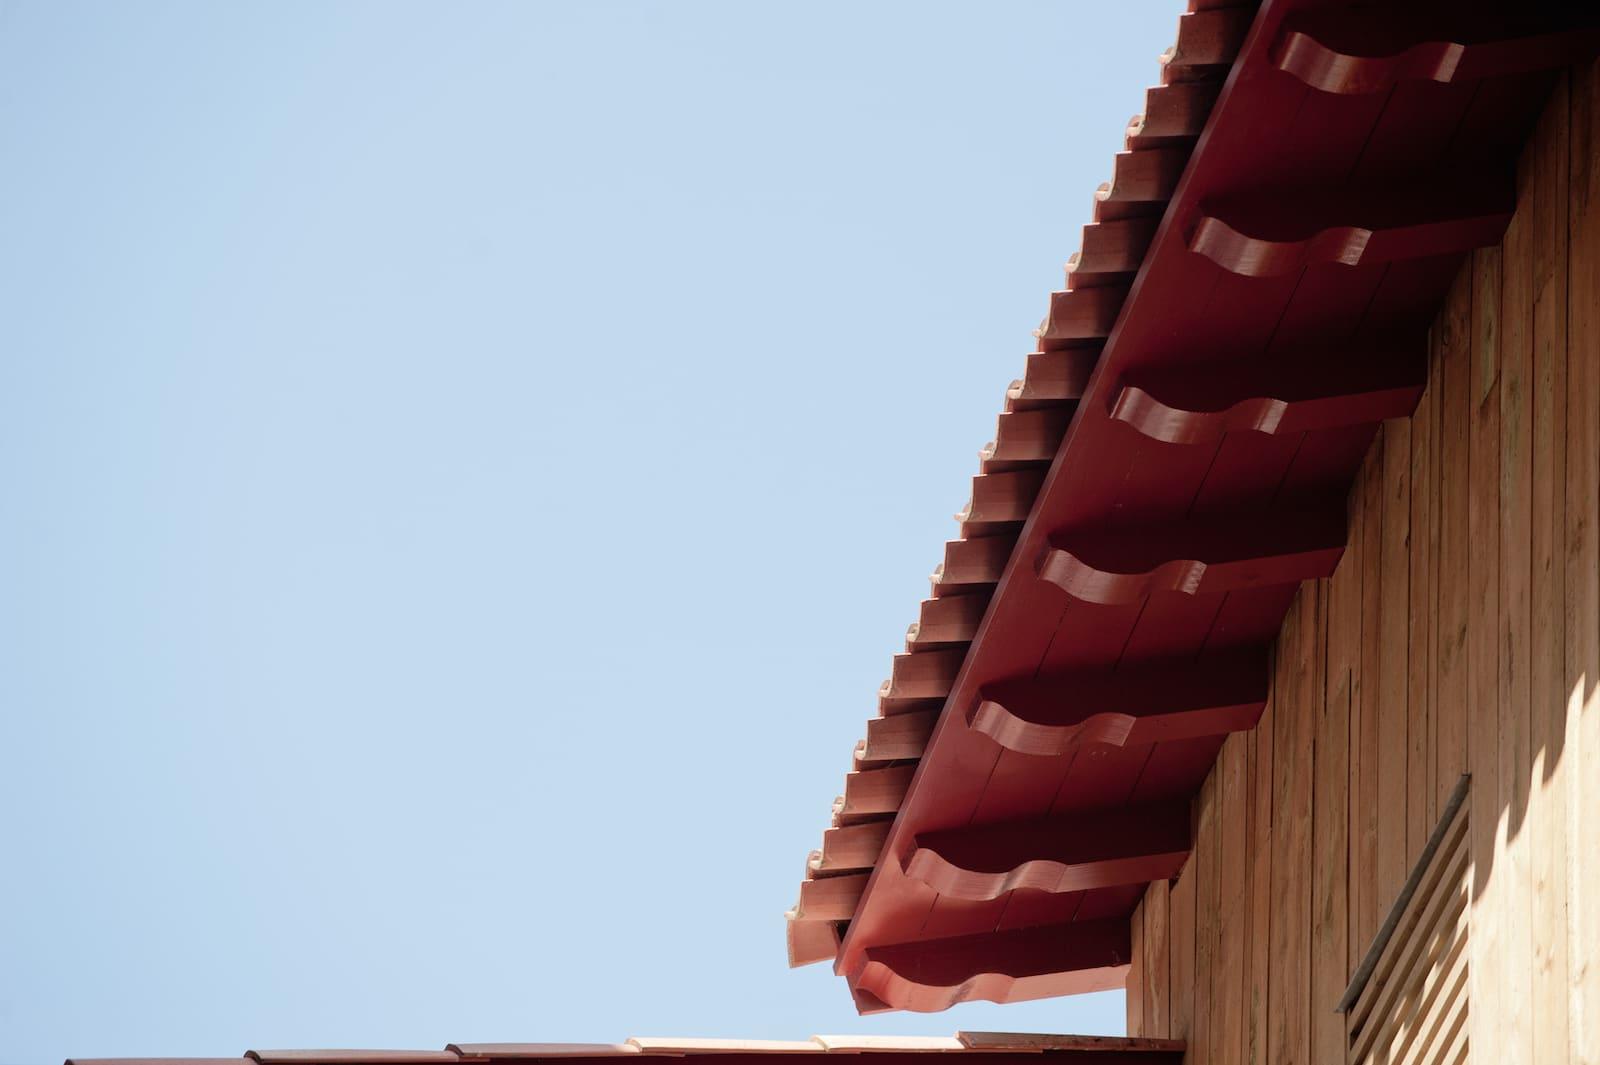 charpente traditionnelle basque